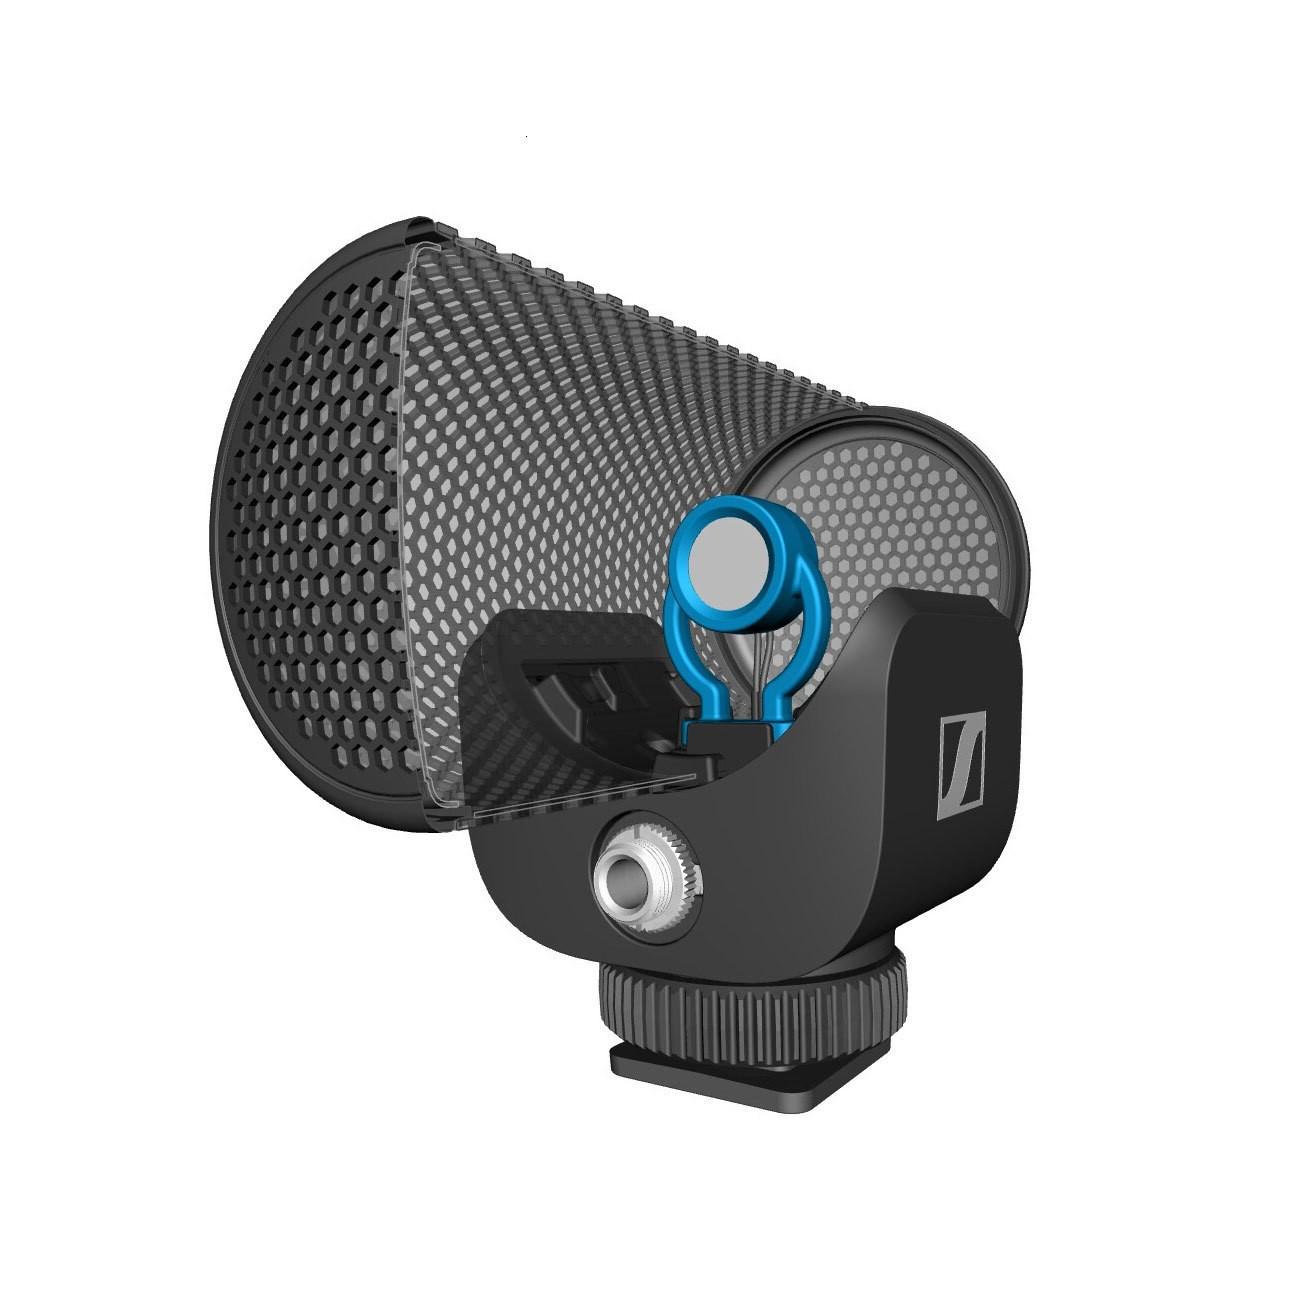 Microfone Supercardioide MKE 200 Sennheiser P/ Live Câmeras